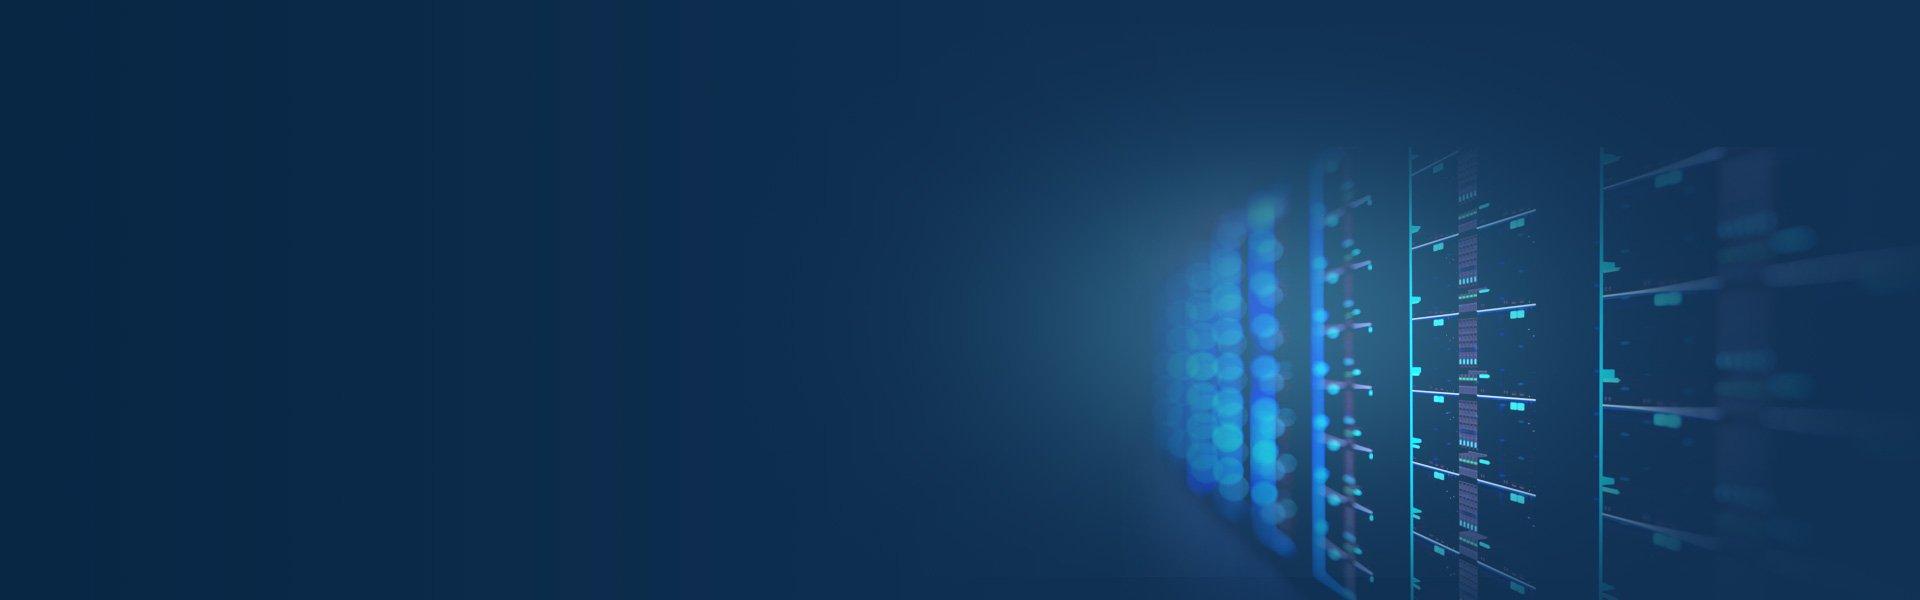 NovaStor_backupsolution_windowsserverbackup_bg